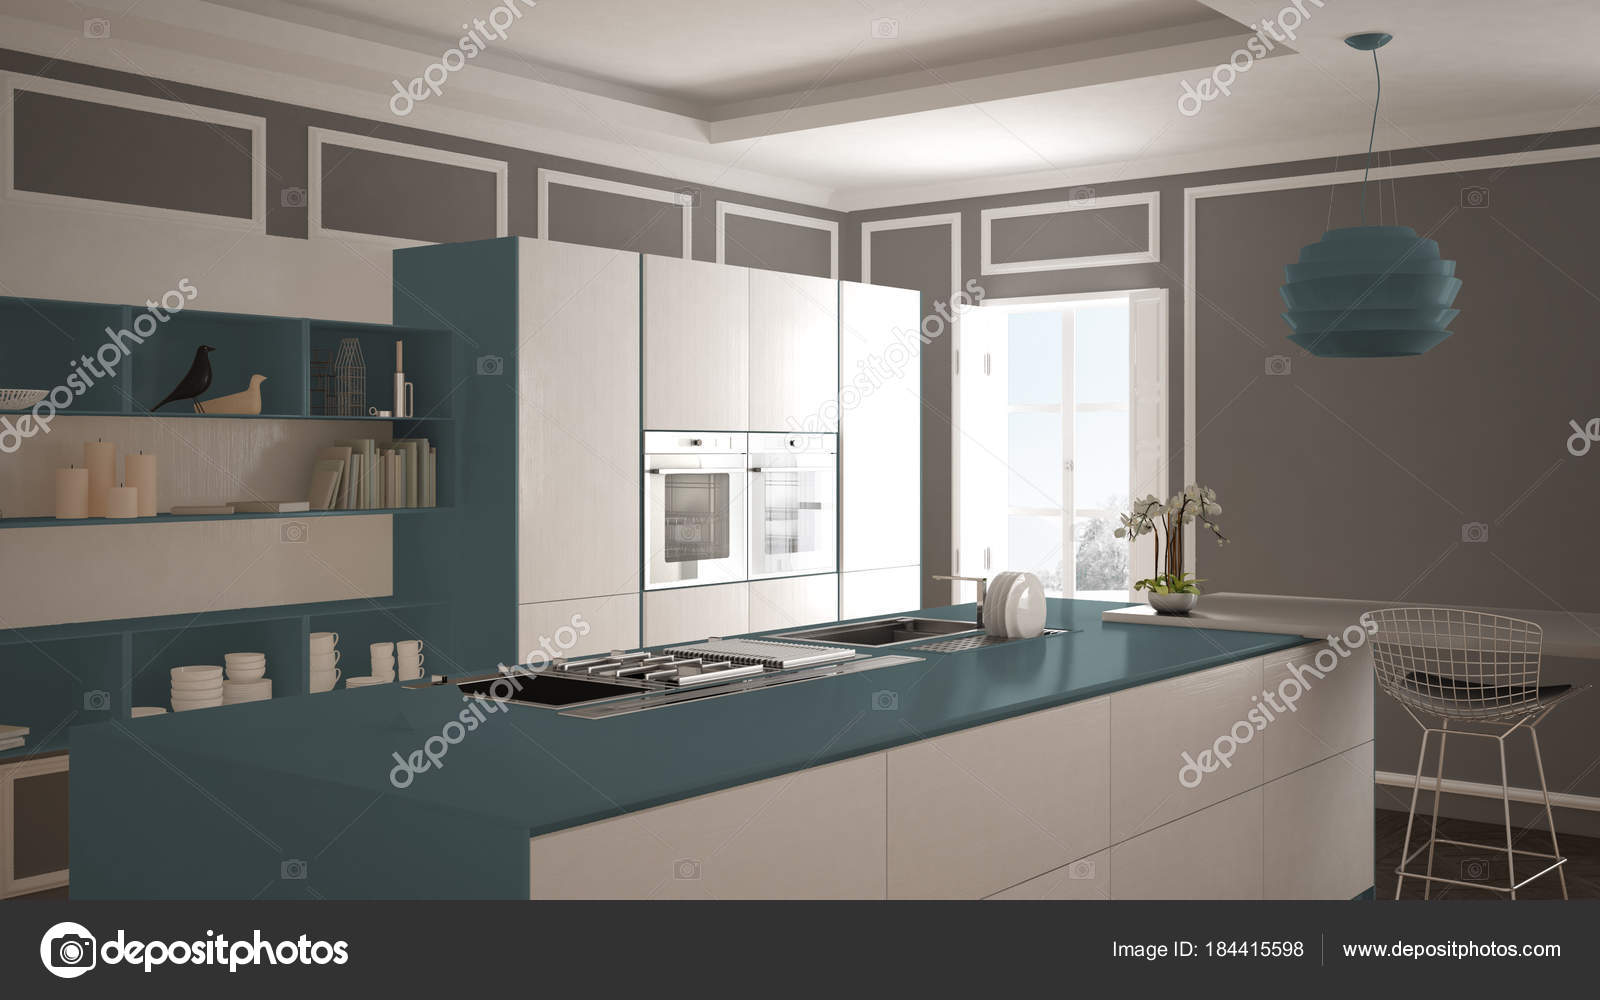 modern kitchen stools commercial sink drain parts 现代厨房在古典内部 海岛与凳子和二个大窗口 白色和蓝色海军建筑室内 白色